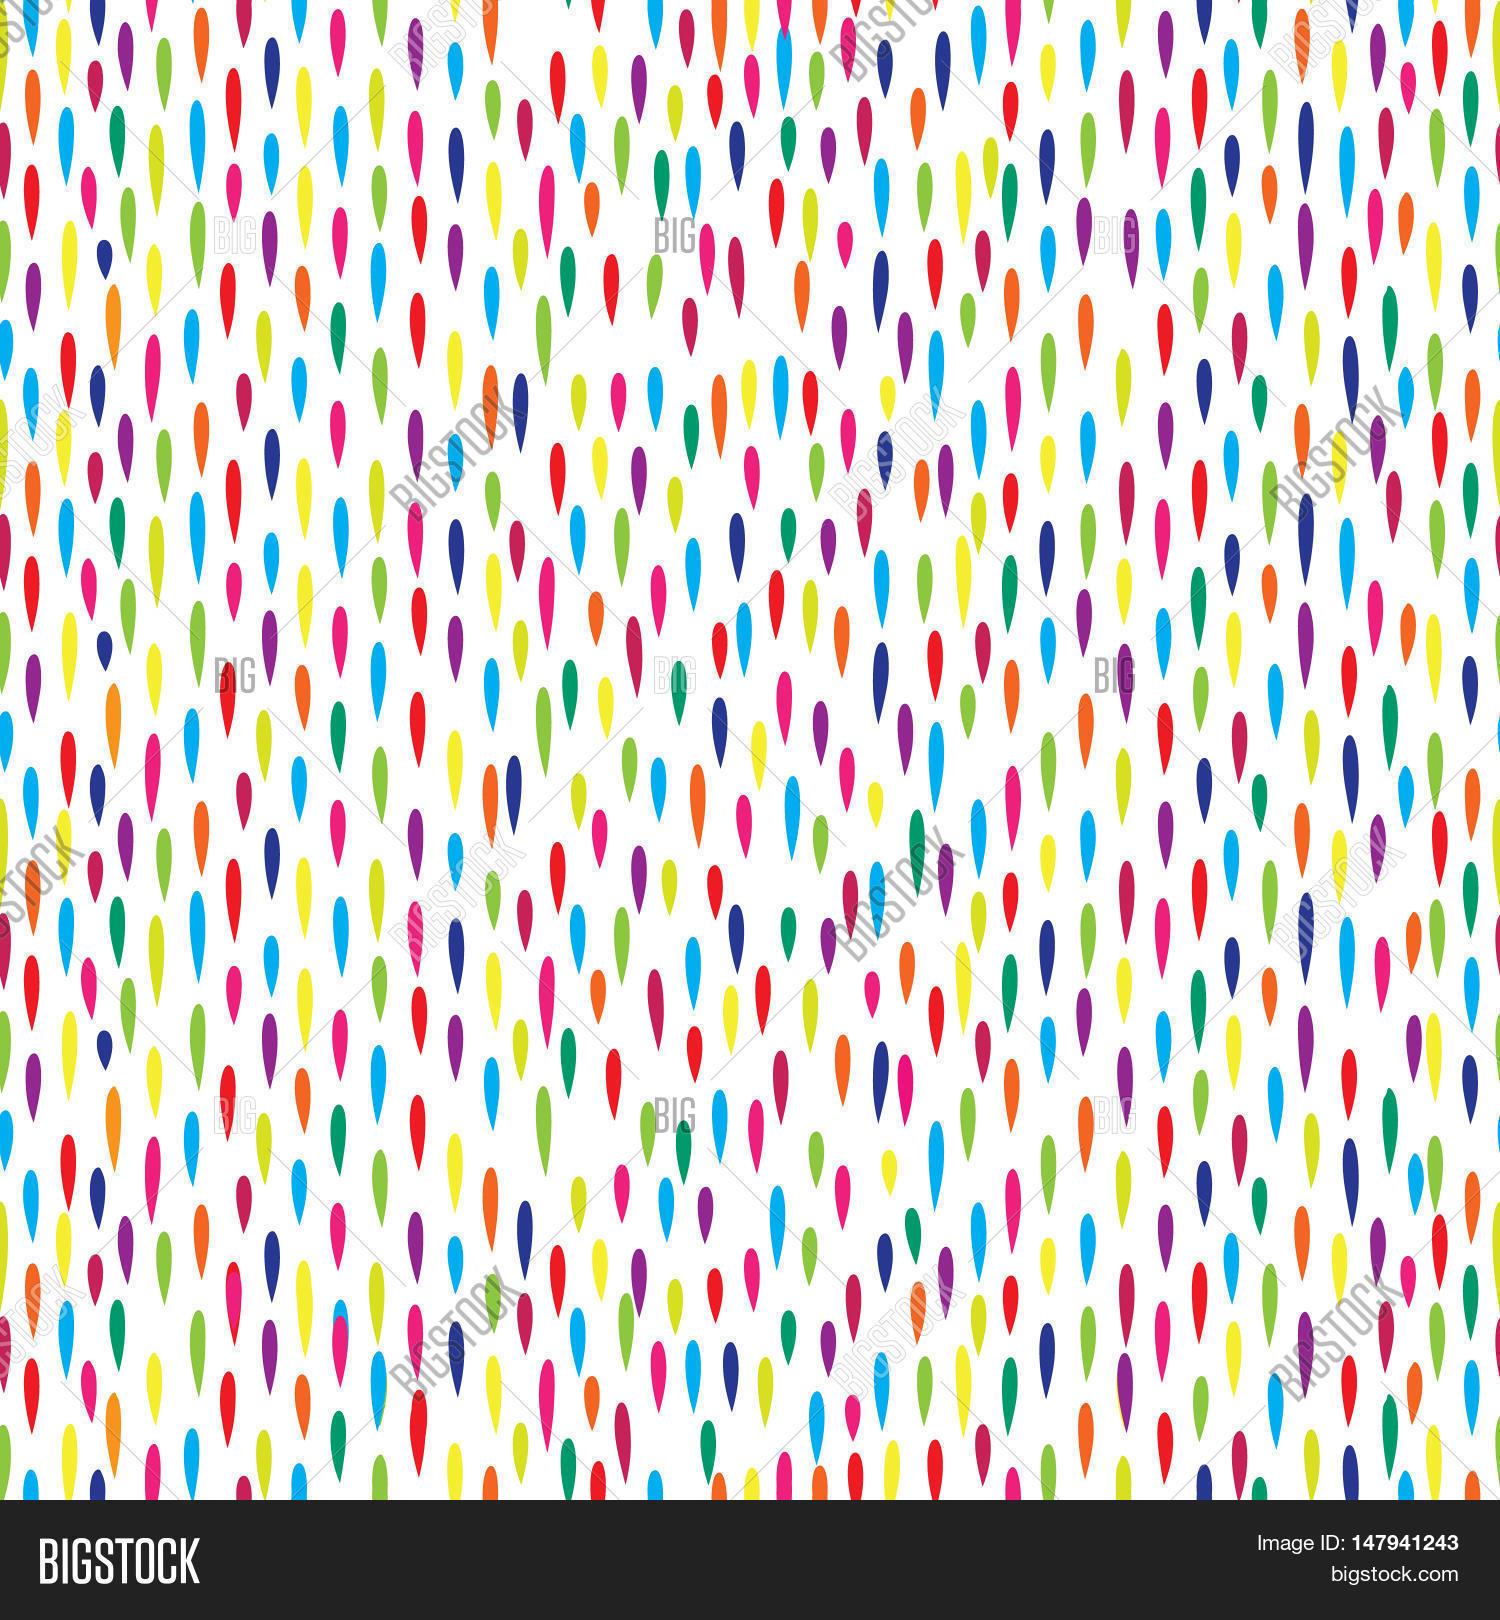 Raindrop Pattern Image Photo Free Trial Bigstock